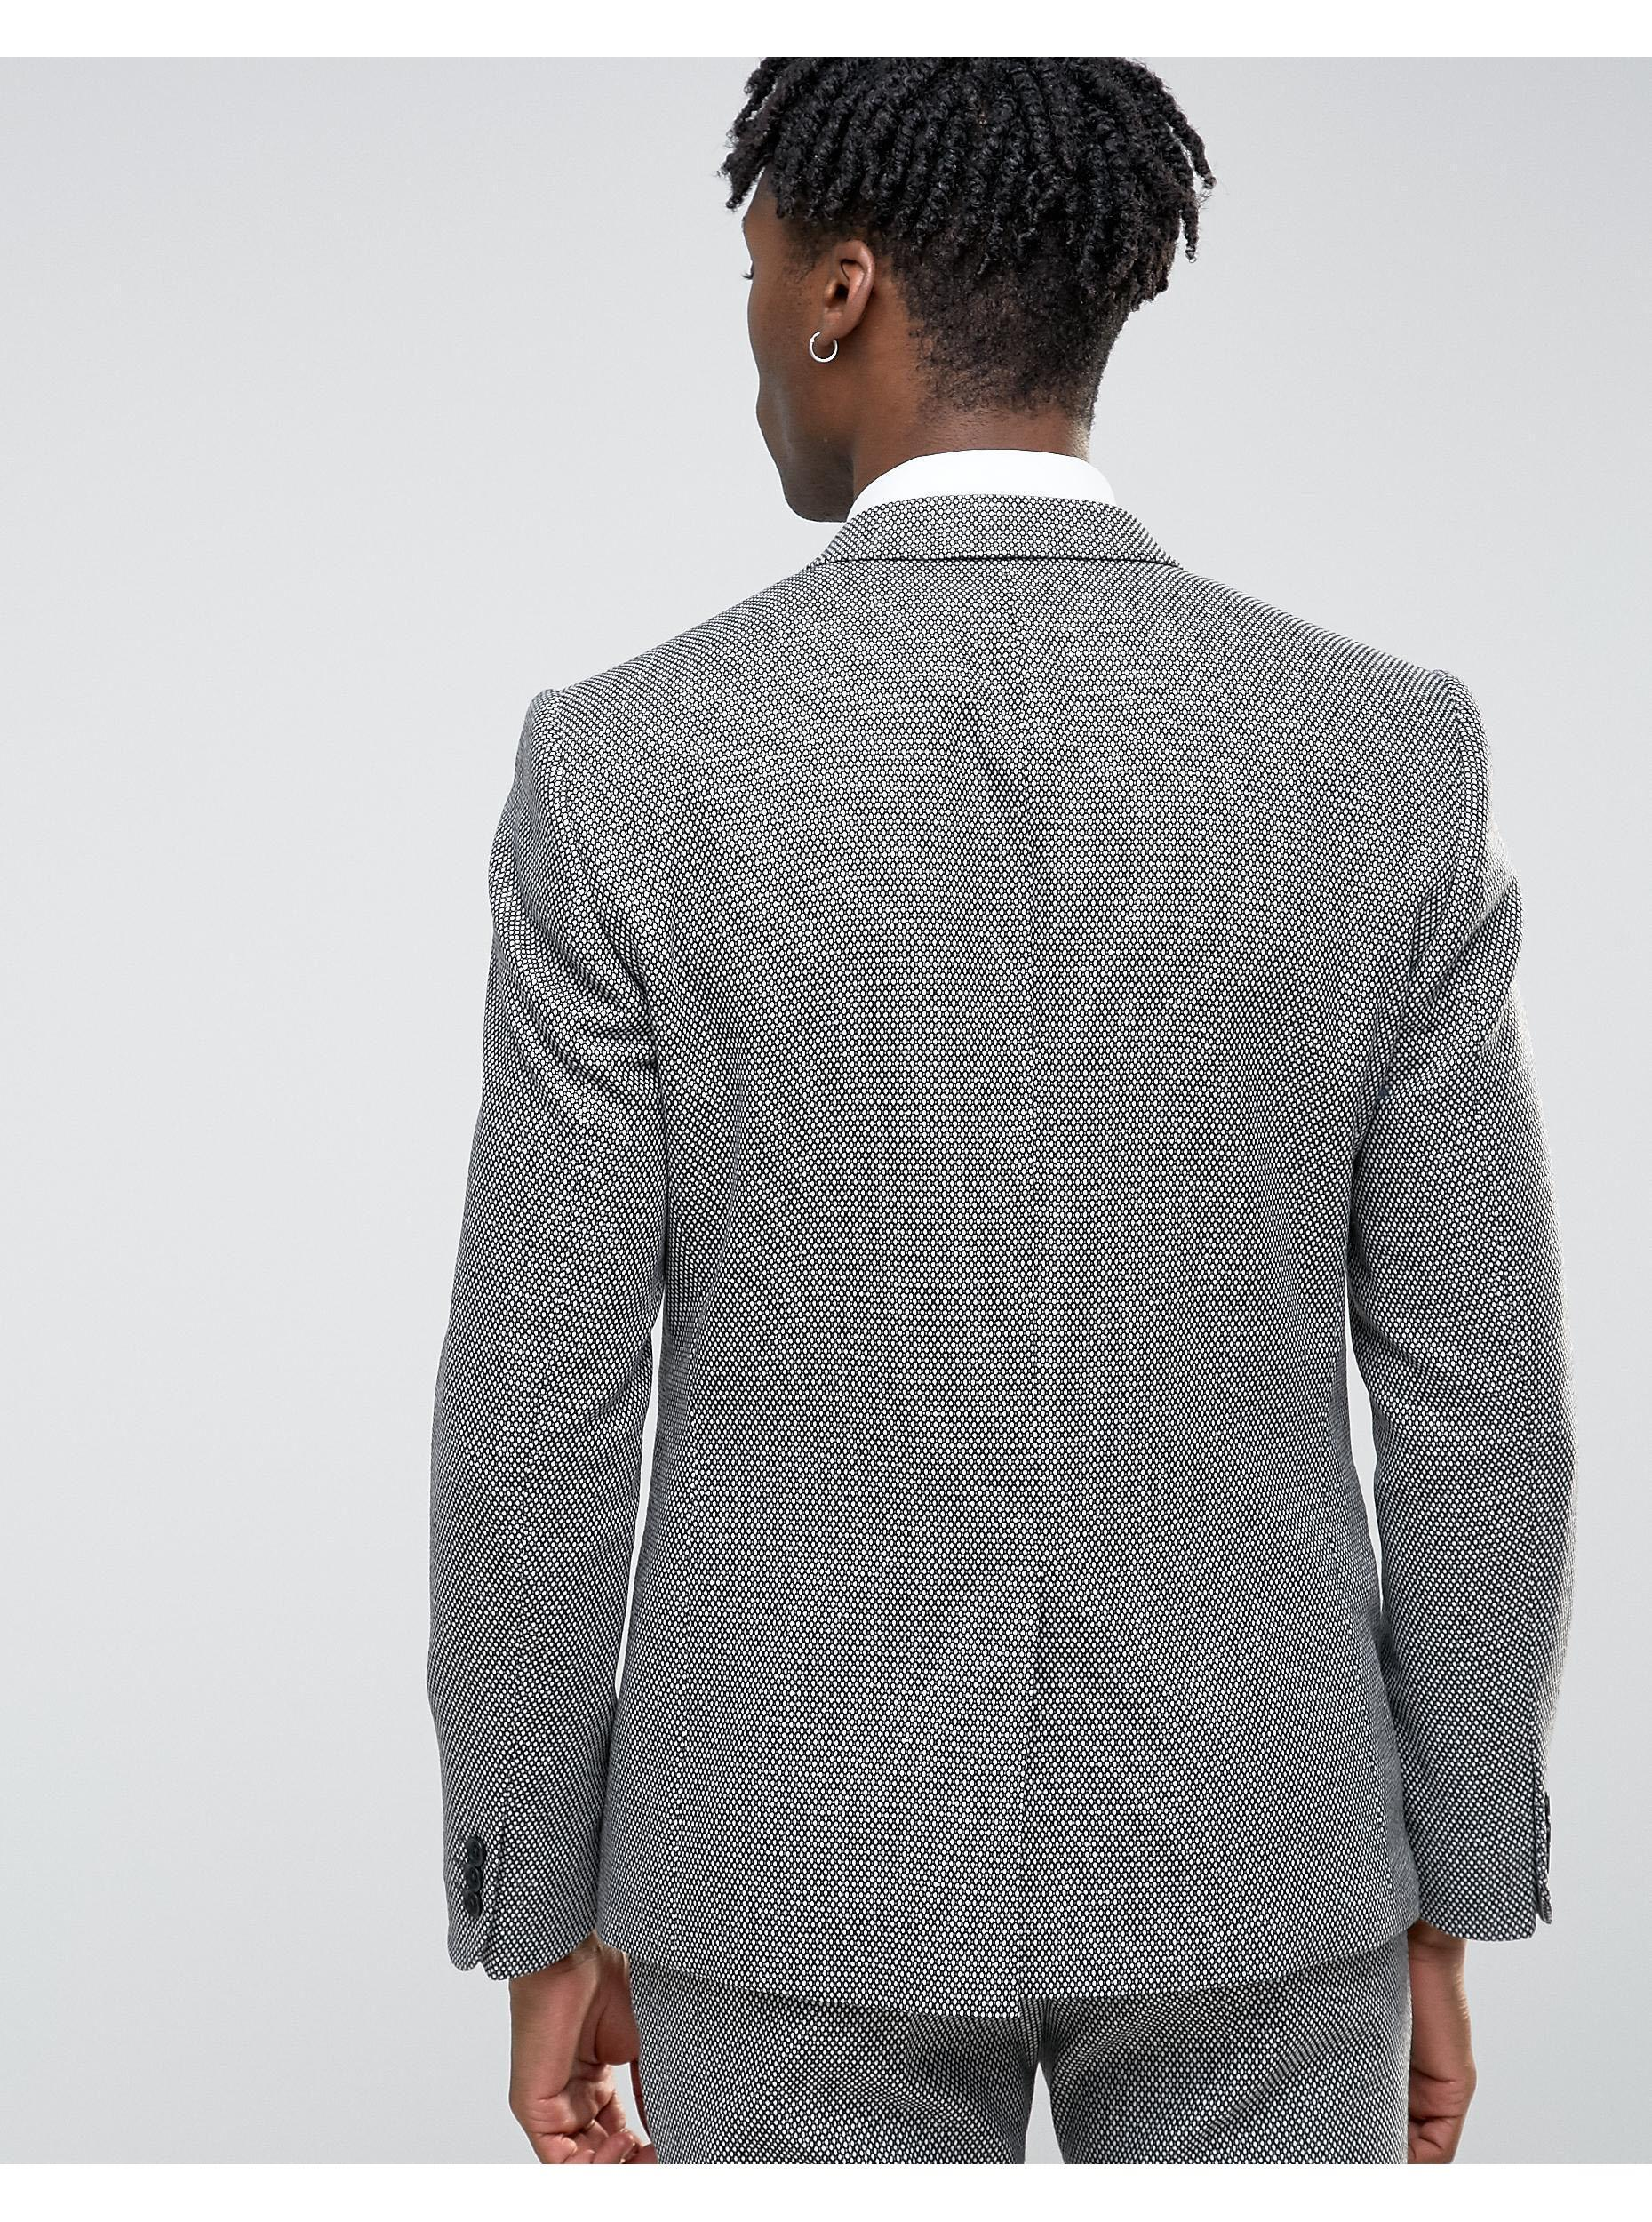 Noak Wool Slim Suit Jacket in Black for Men